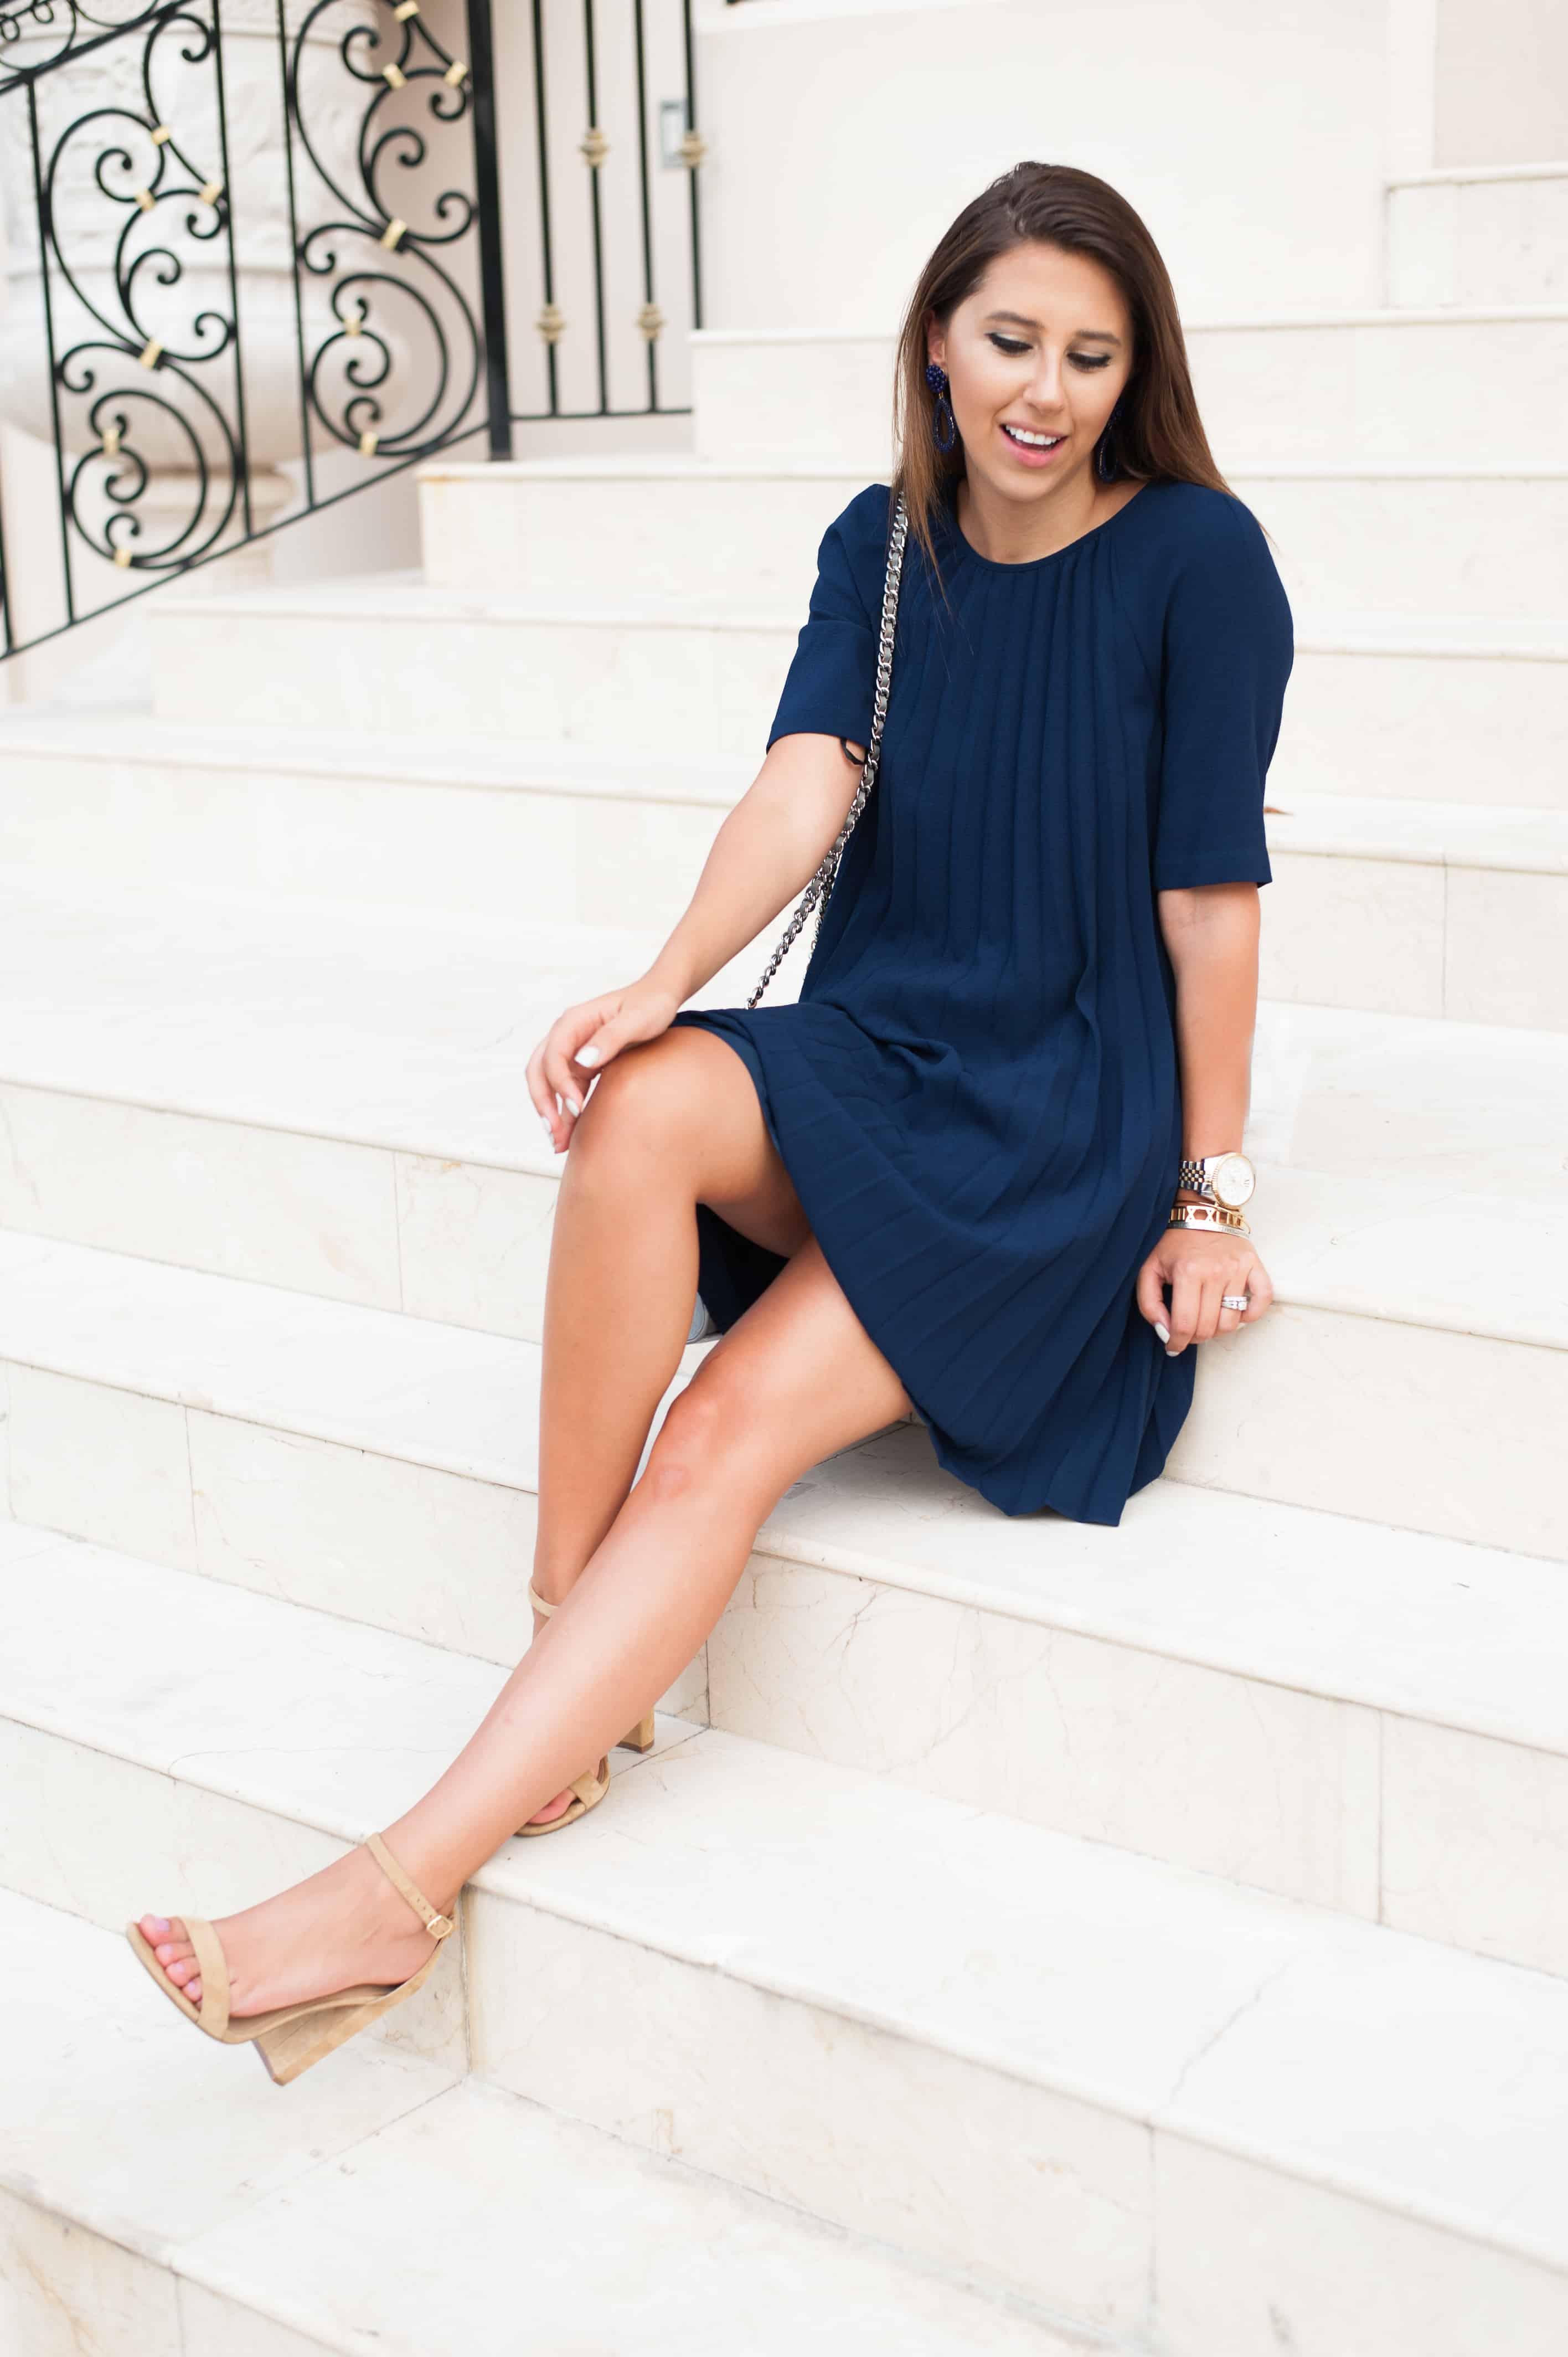 dress_up_buttercup_dede_raad_houston_fashion_fashion_blog_nordstromsale_maggylondon_pleateddress (1 of 1)